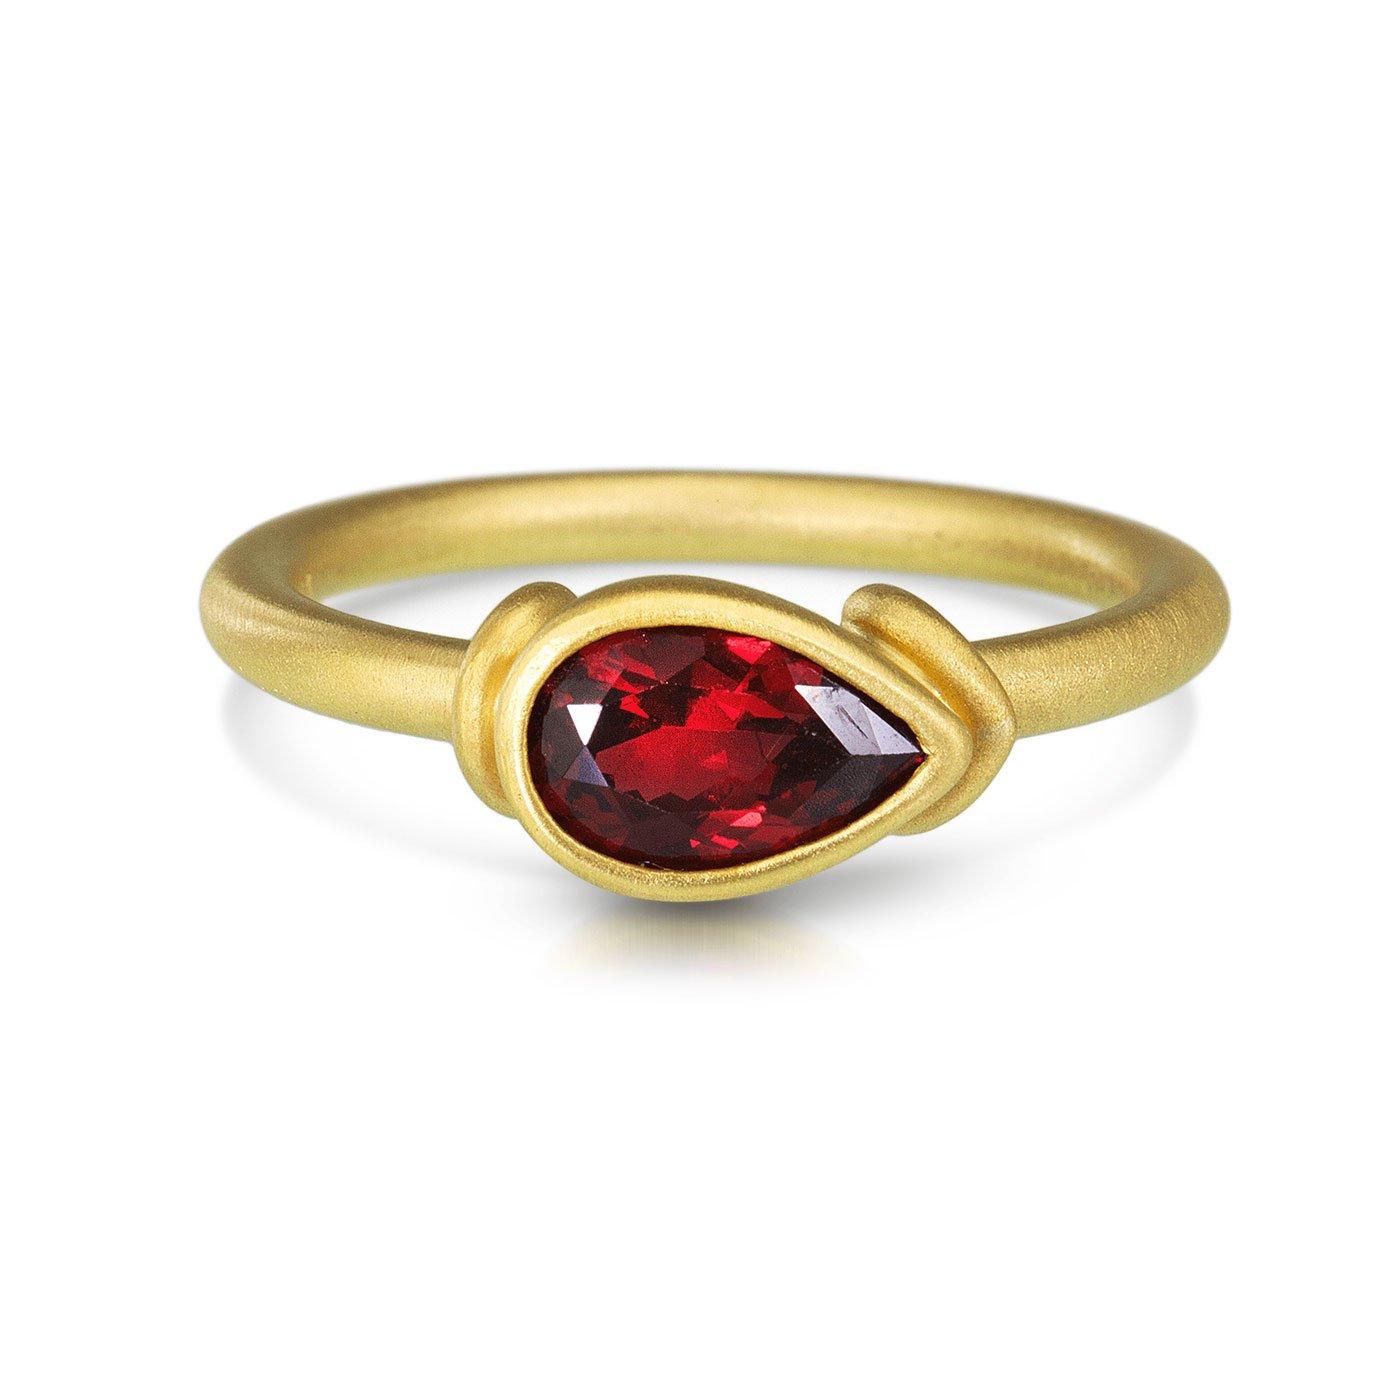 Denise Betesh - rings